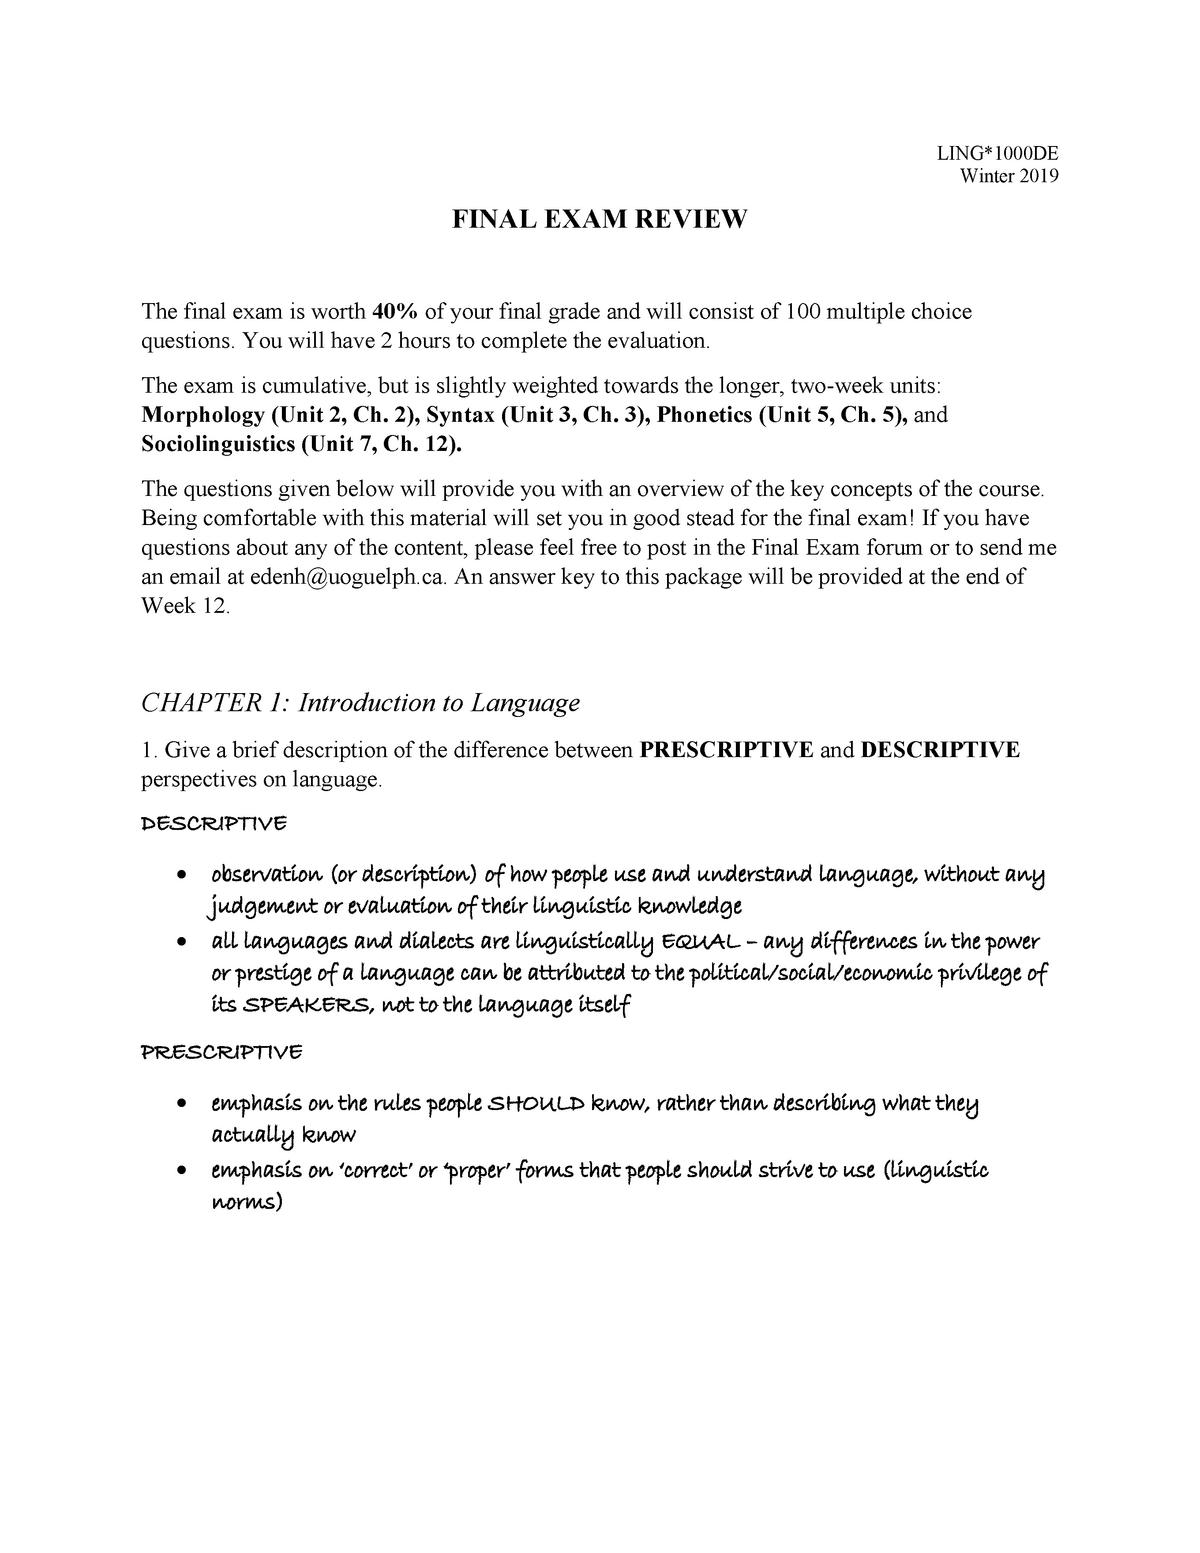 LING 1000DE Final Exam Review Package - Answer Key - StuDocu